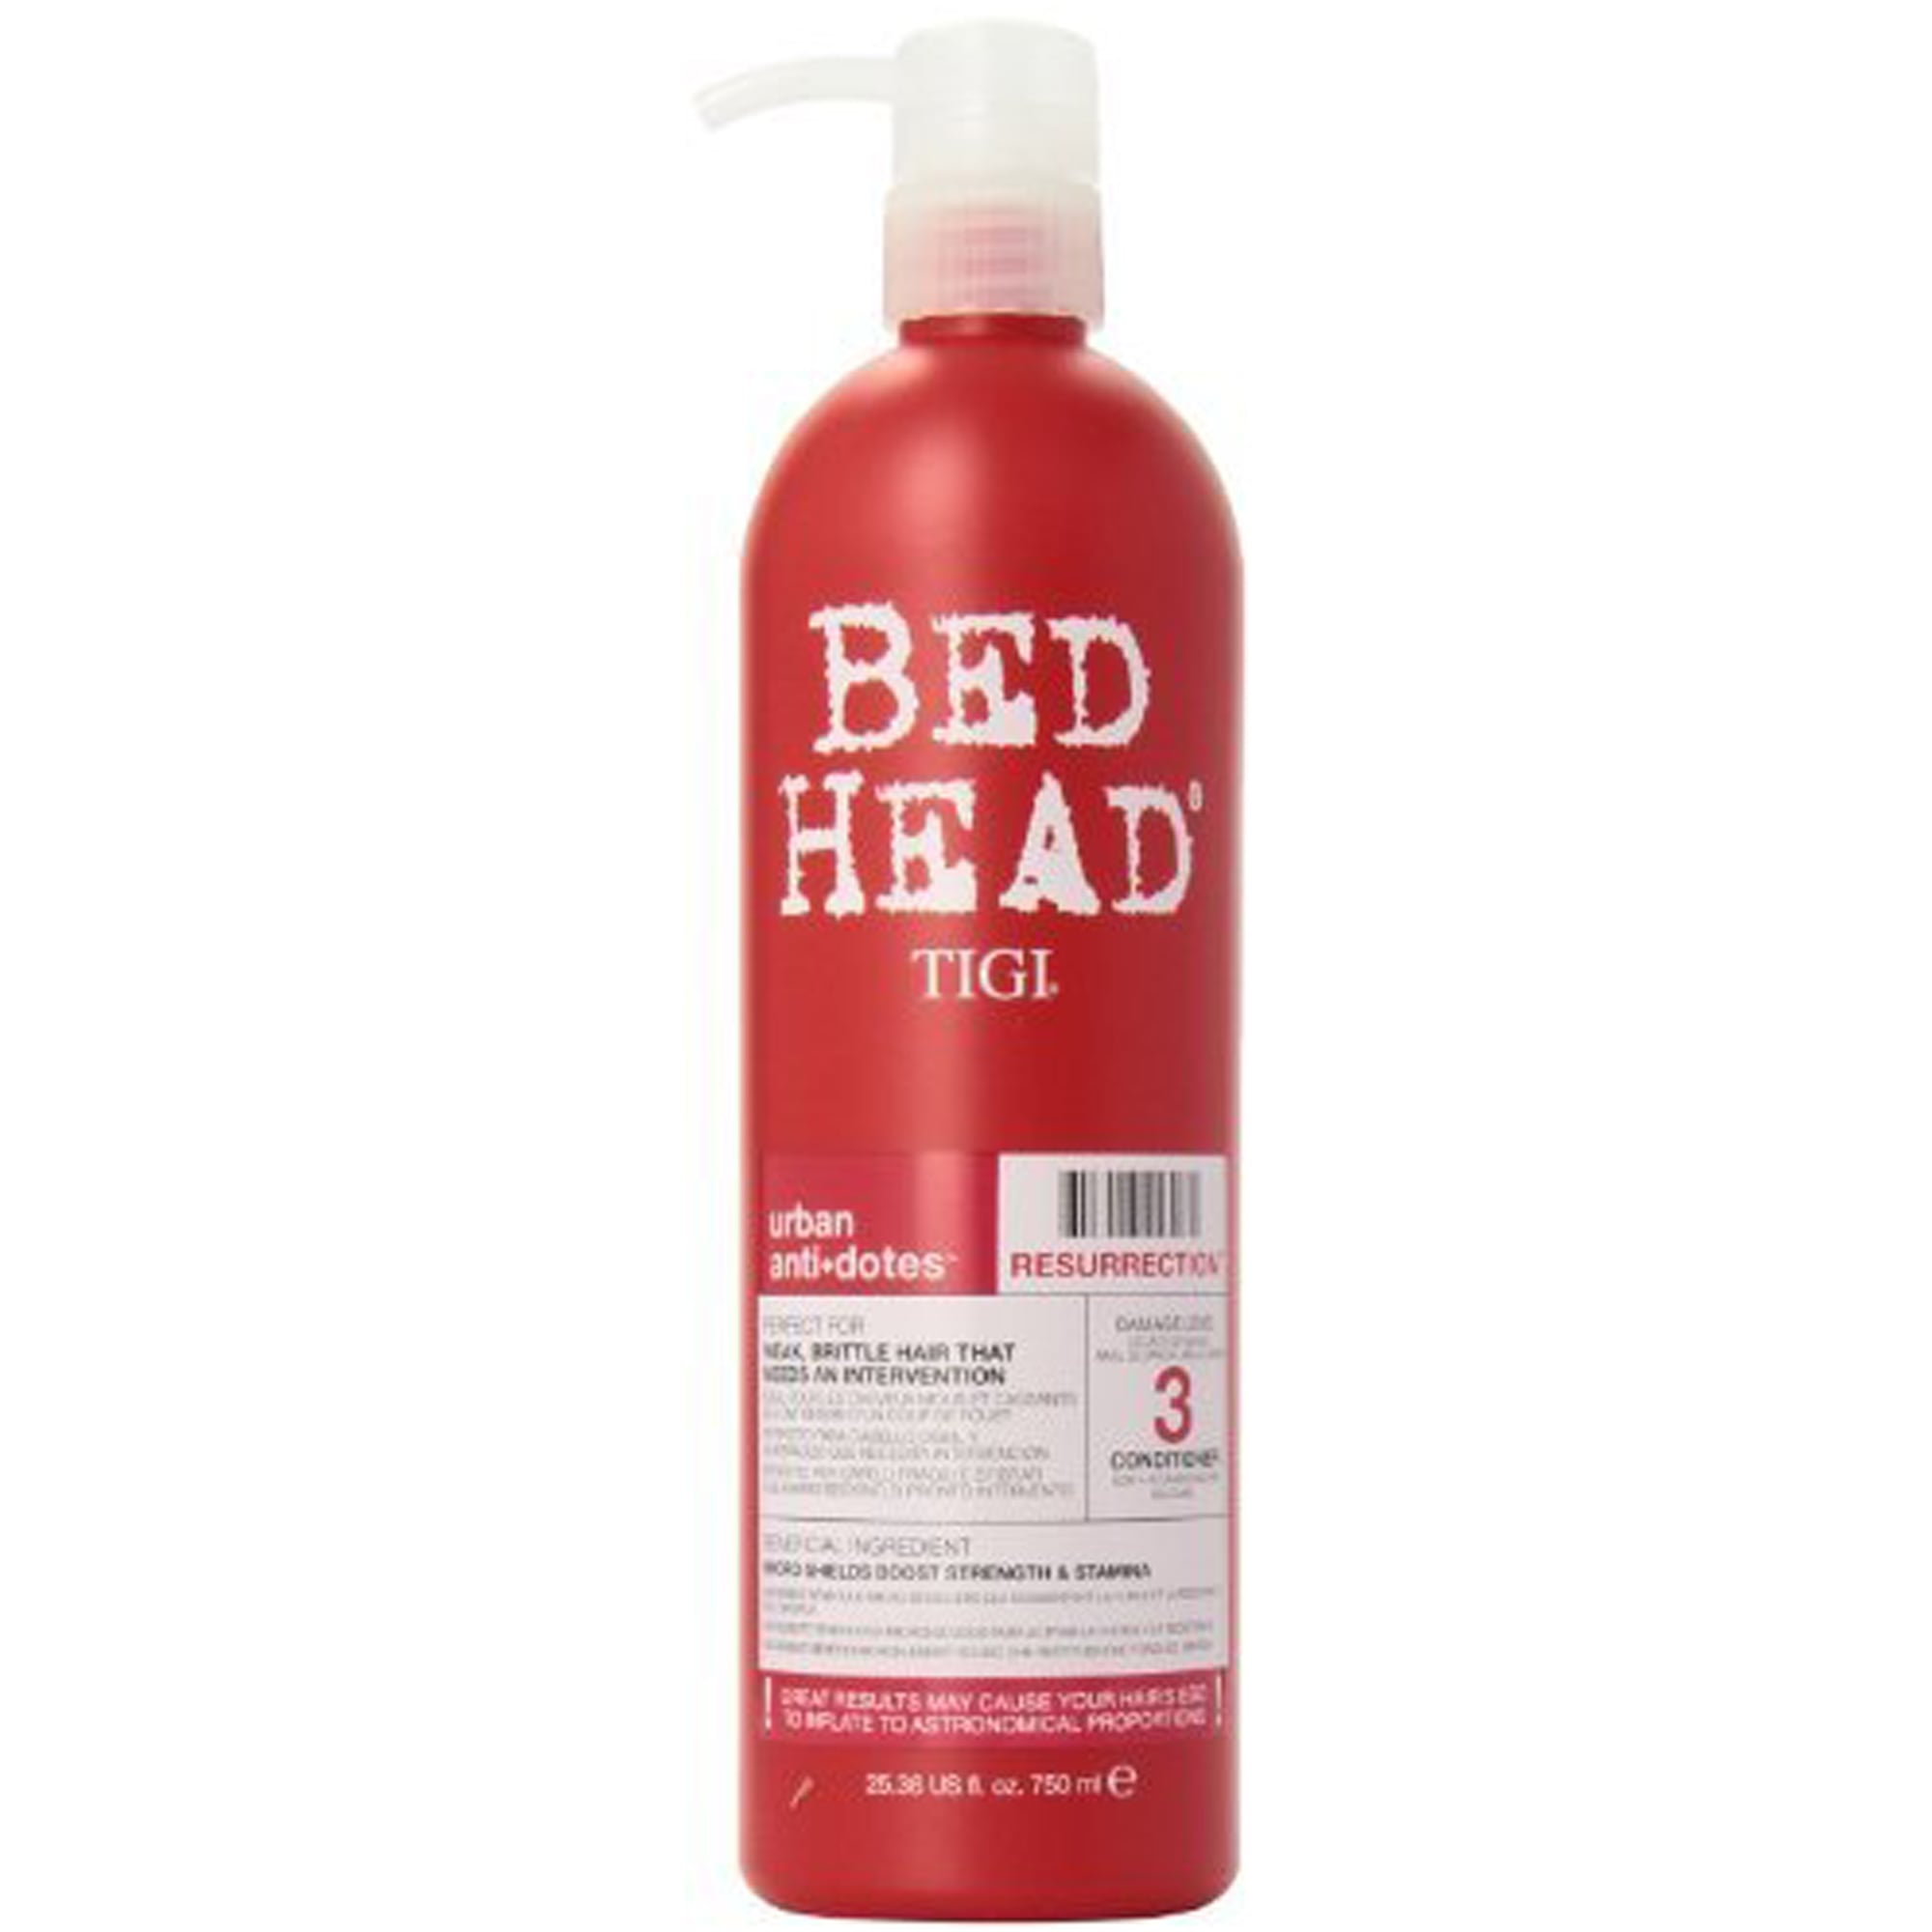 tigi bed head urban antidotes resurrection conditioner damage level 3 750ml. Black Bedroom Furniture Sets. Home Design Ideas